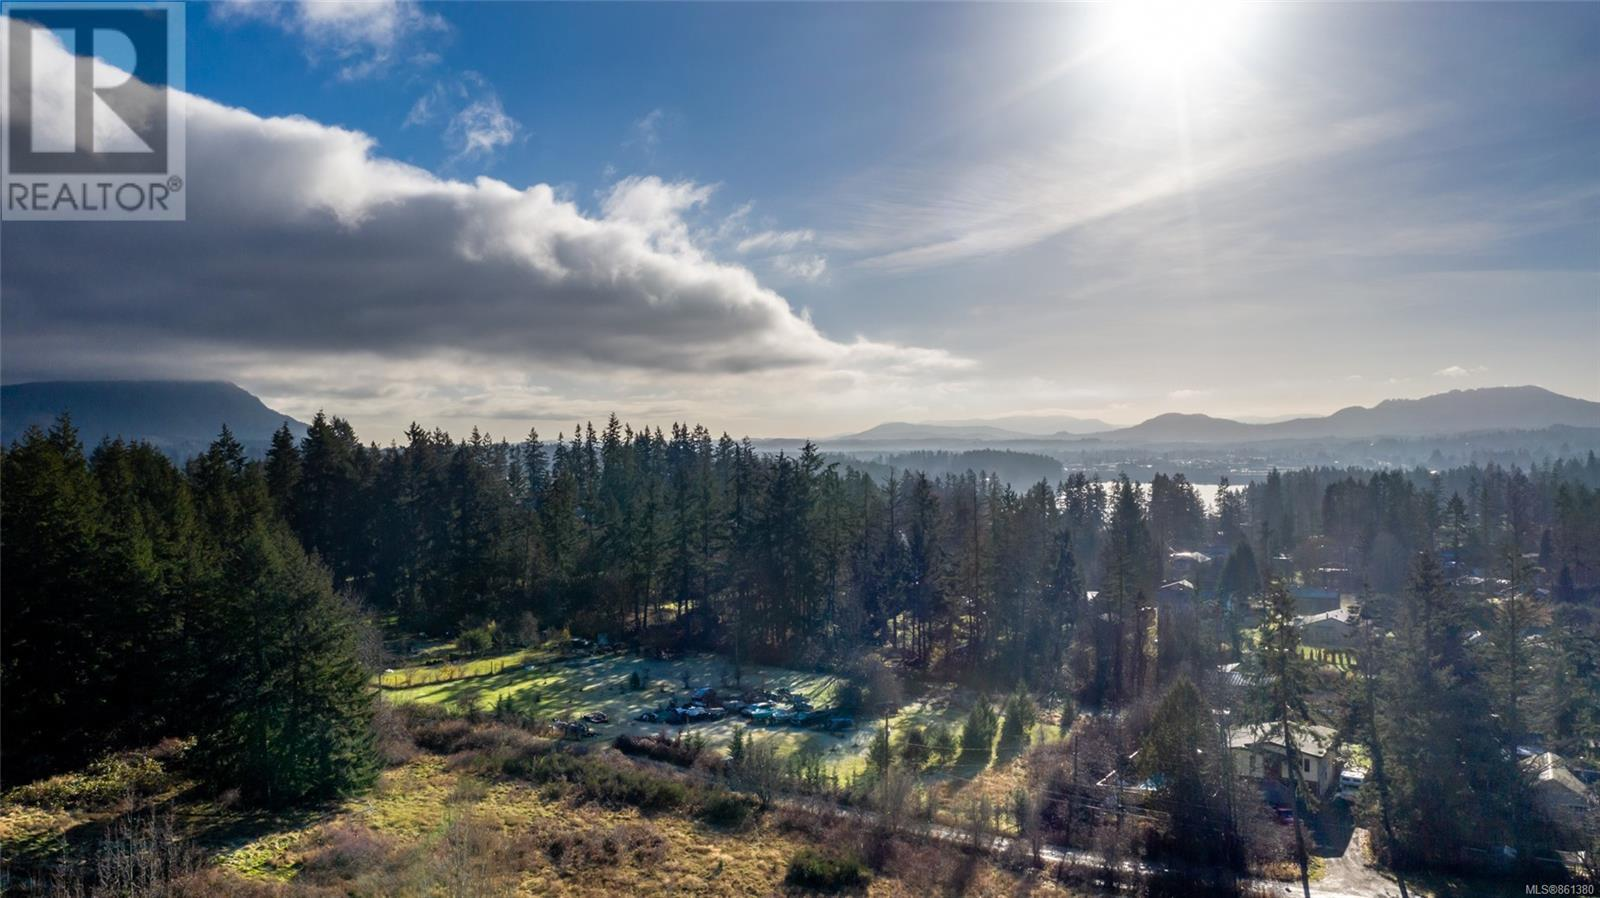 6790 Bell Mckinnon RdDuncan, British Columbia  V9L 6B7 - Photo 4 - 861380